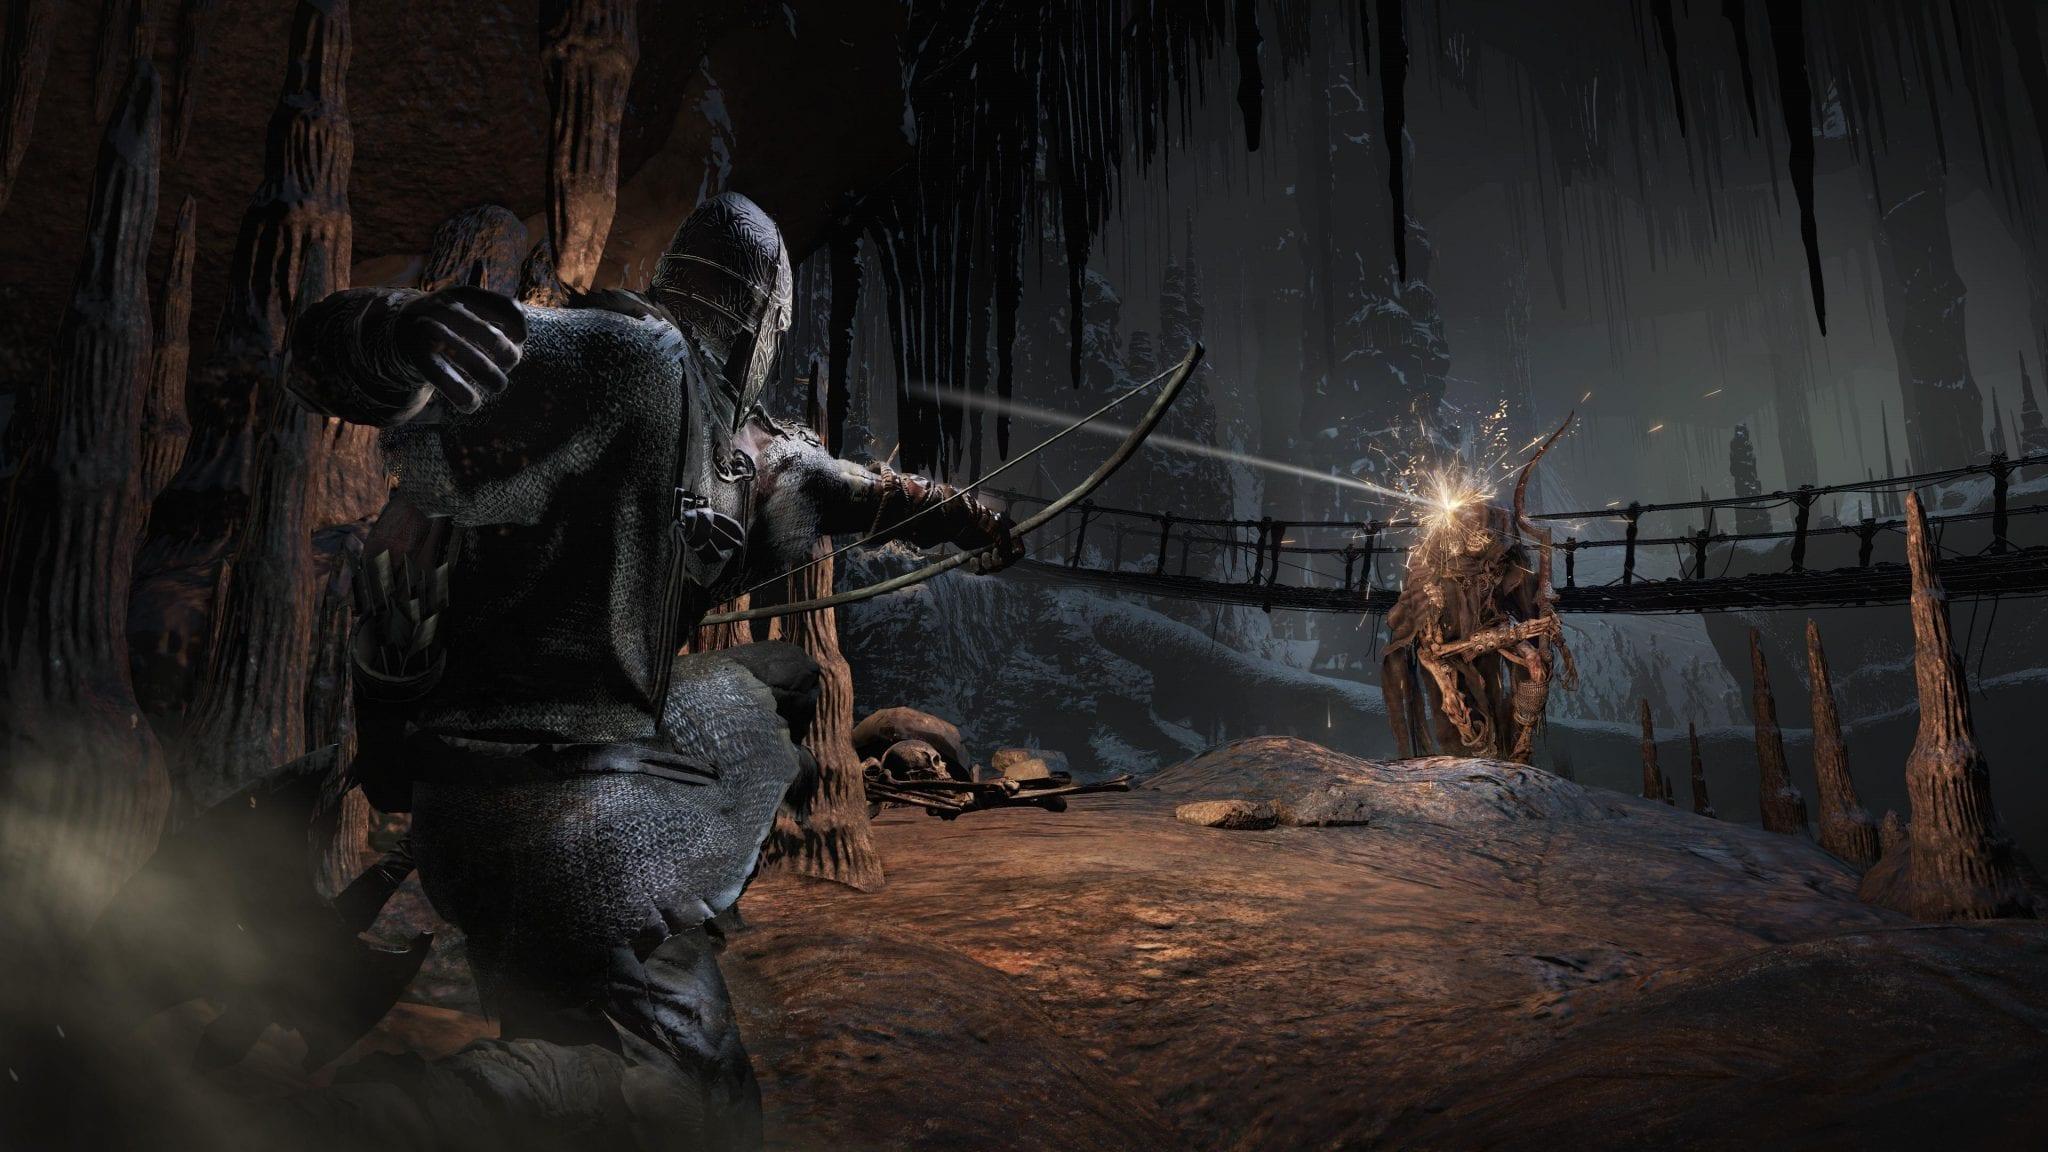 Dark Souls 3 screens are grim and creepy | PC Invasion